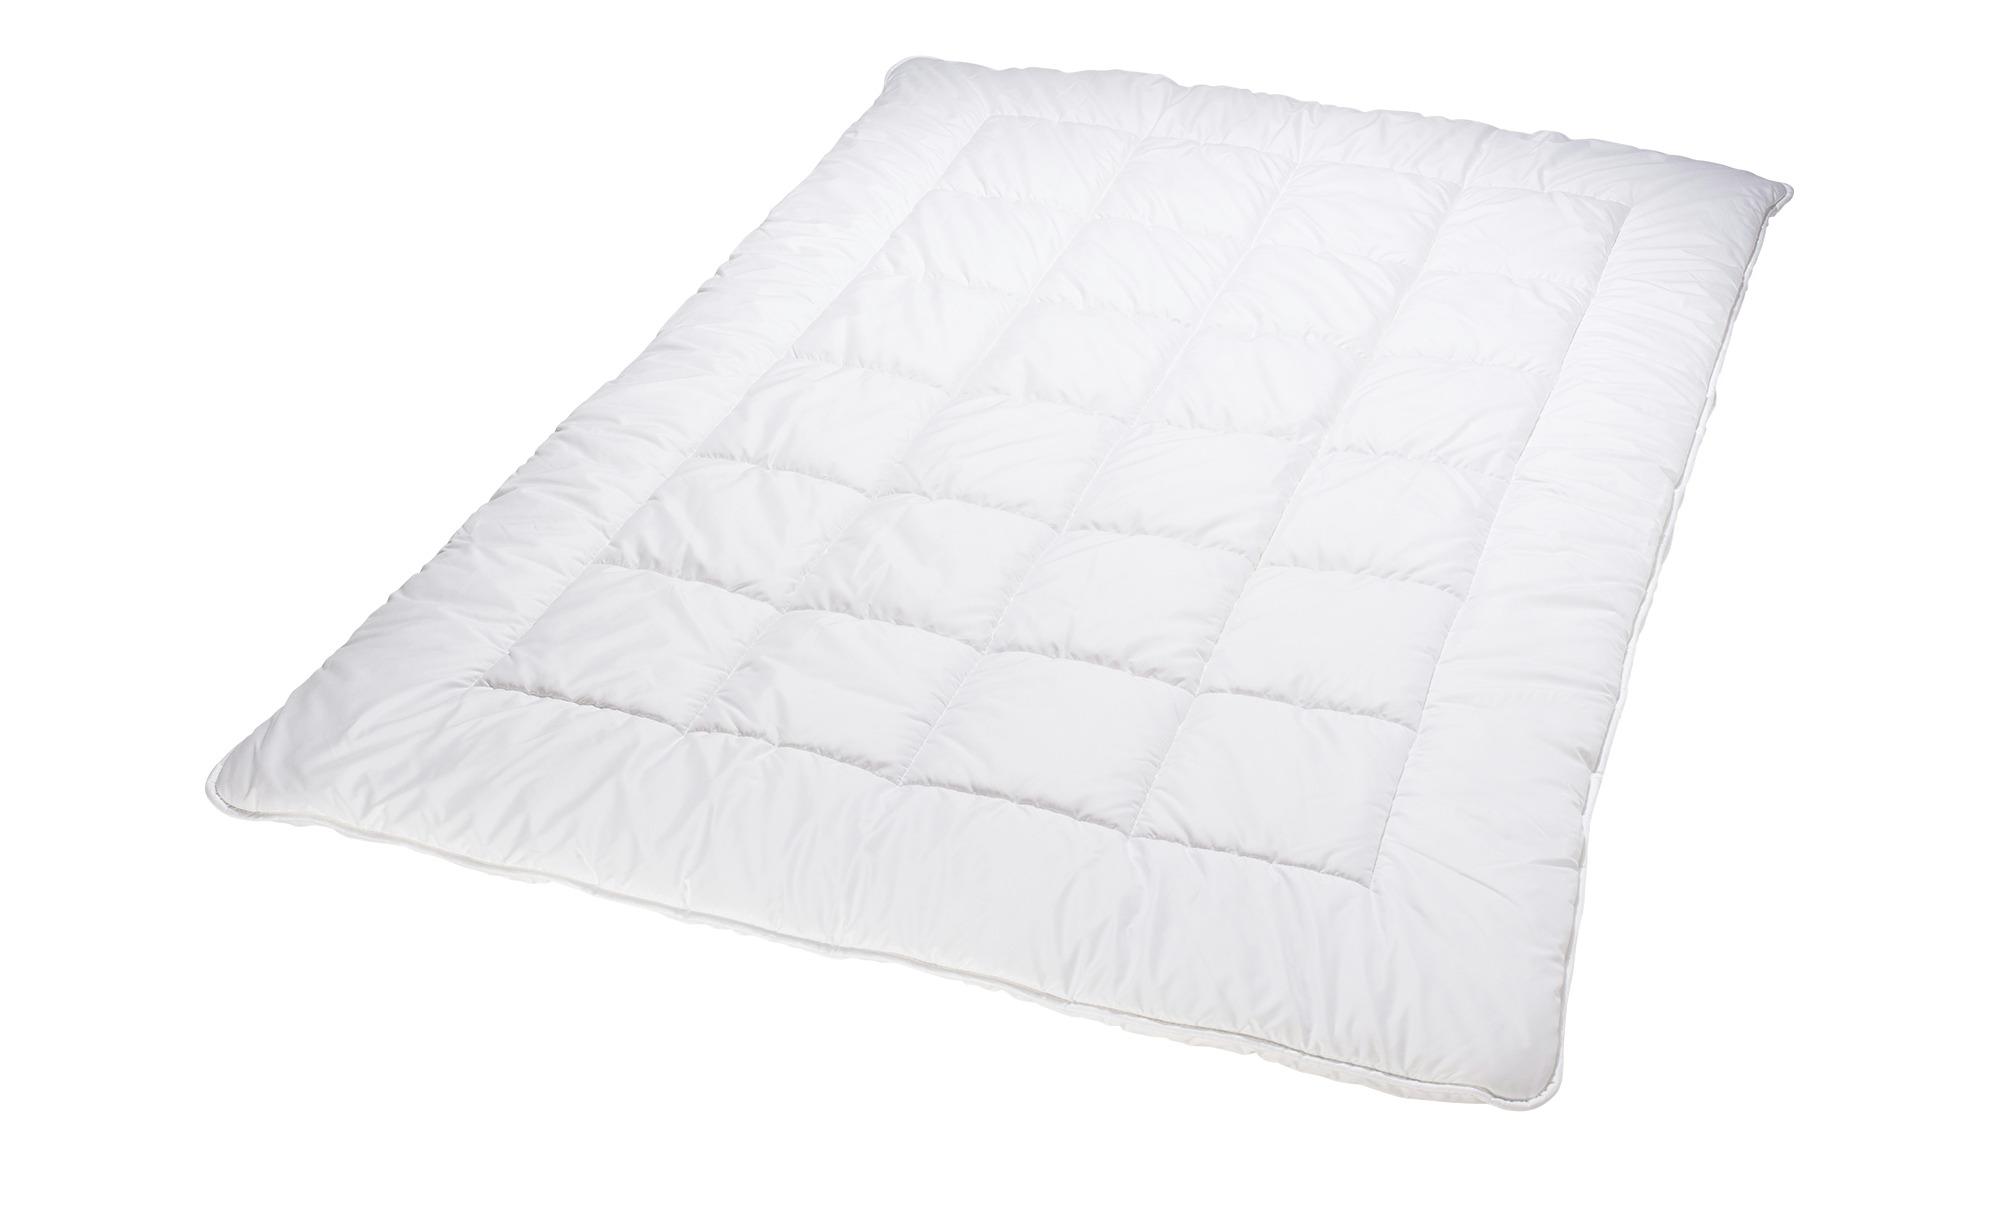 Billerbeck Duo-Steppbett  Granat ¦ weiß ¦ Maße (cm): B: 155 Bettwaren > Bettdecken > Bettdecken in Übergrößen - Höffner